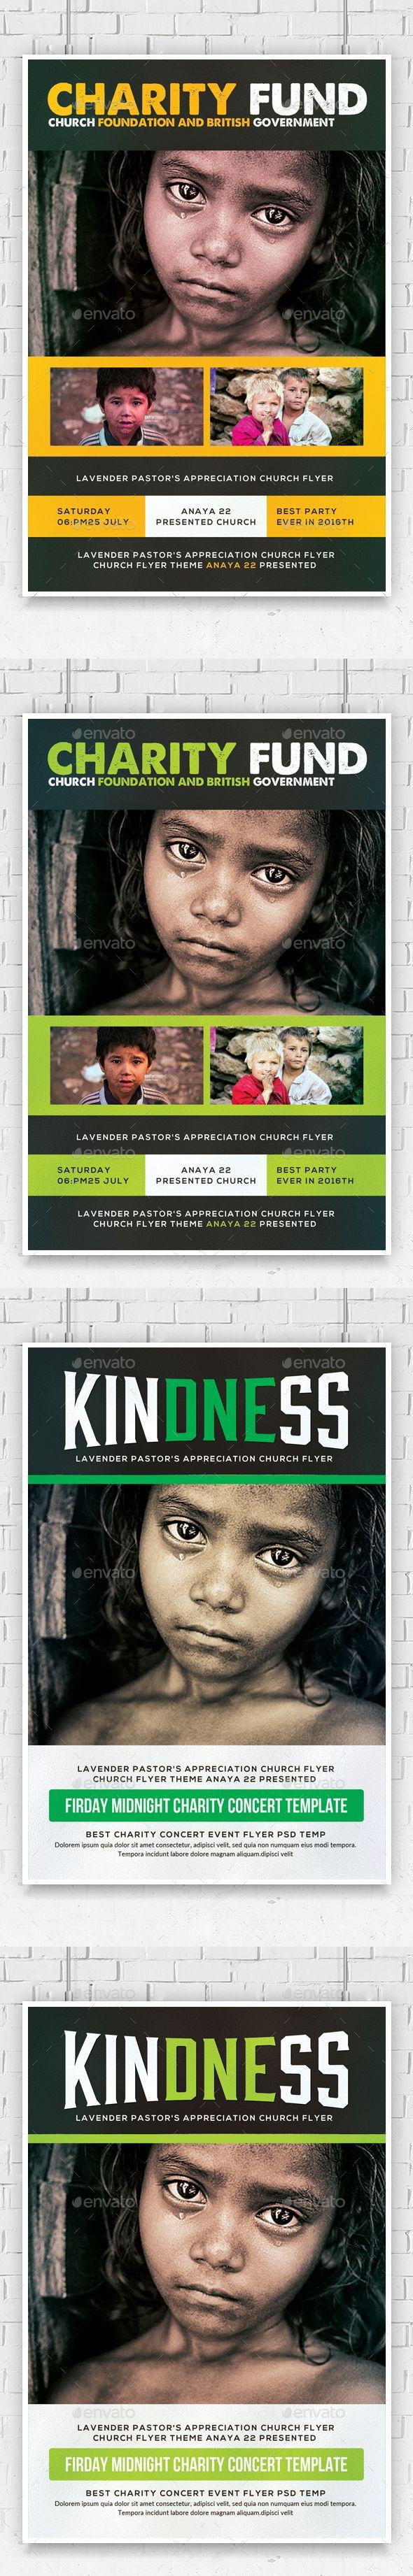 Charity Donation Flyers Bundle | Pinterest | Flyer template, Fonts ...